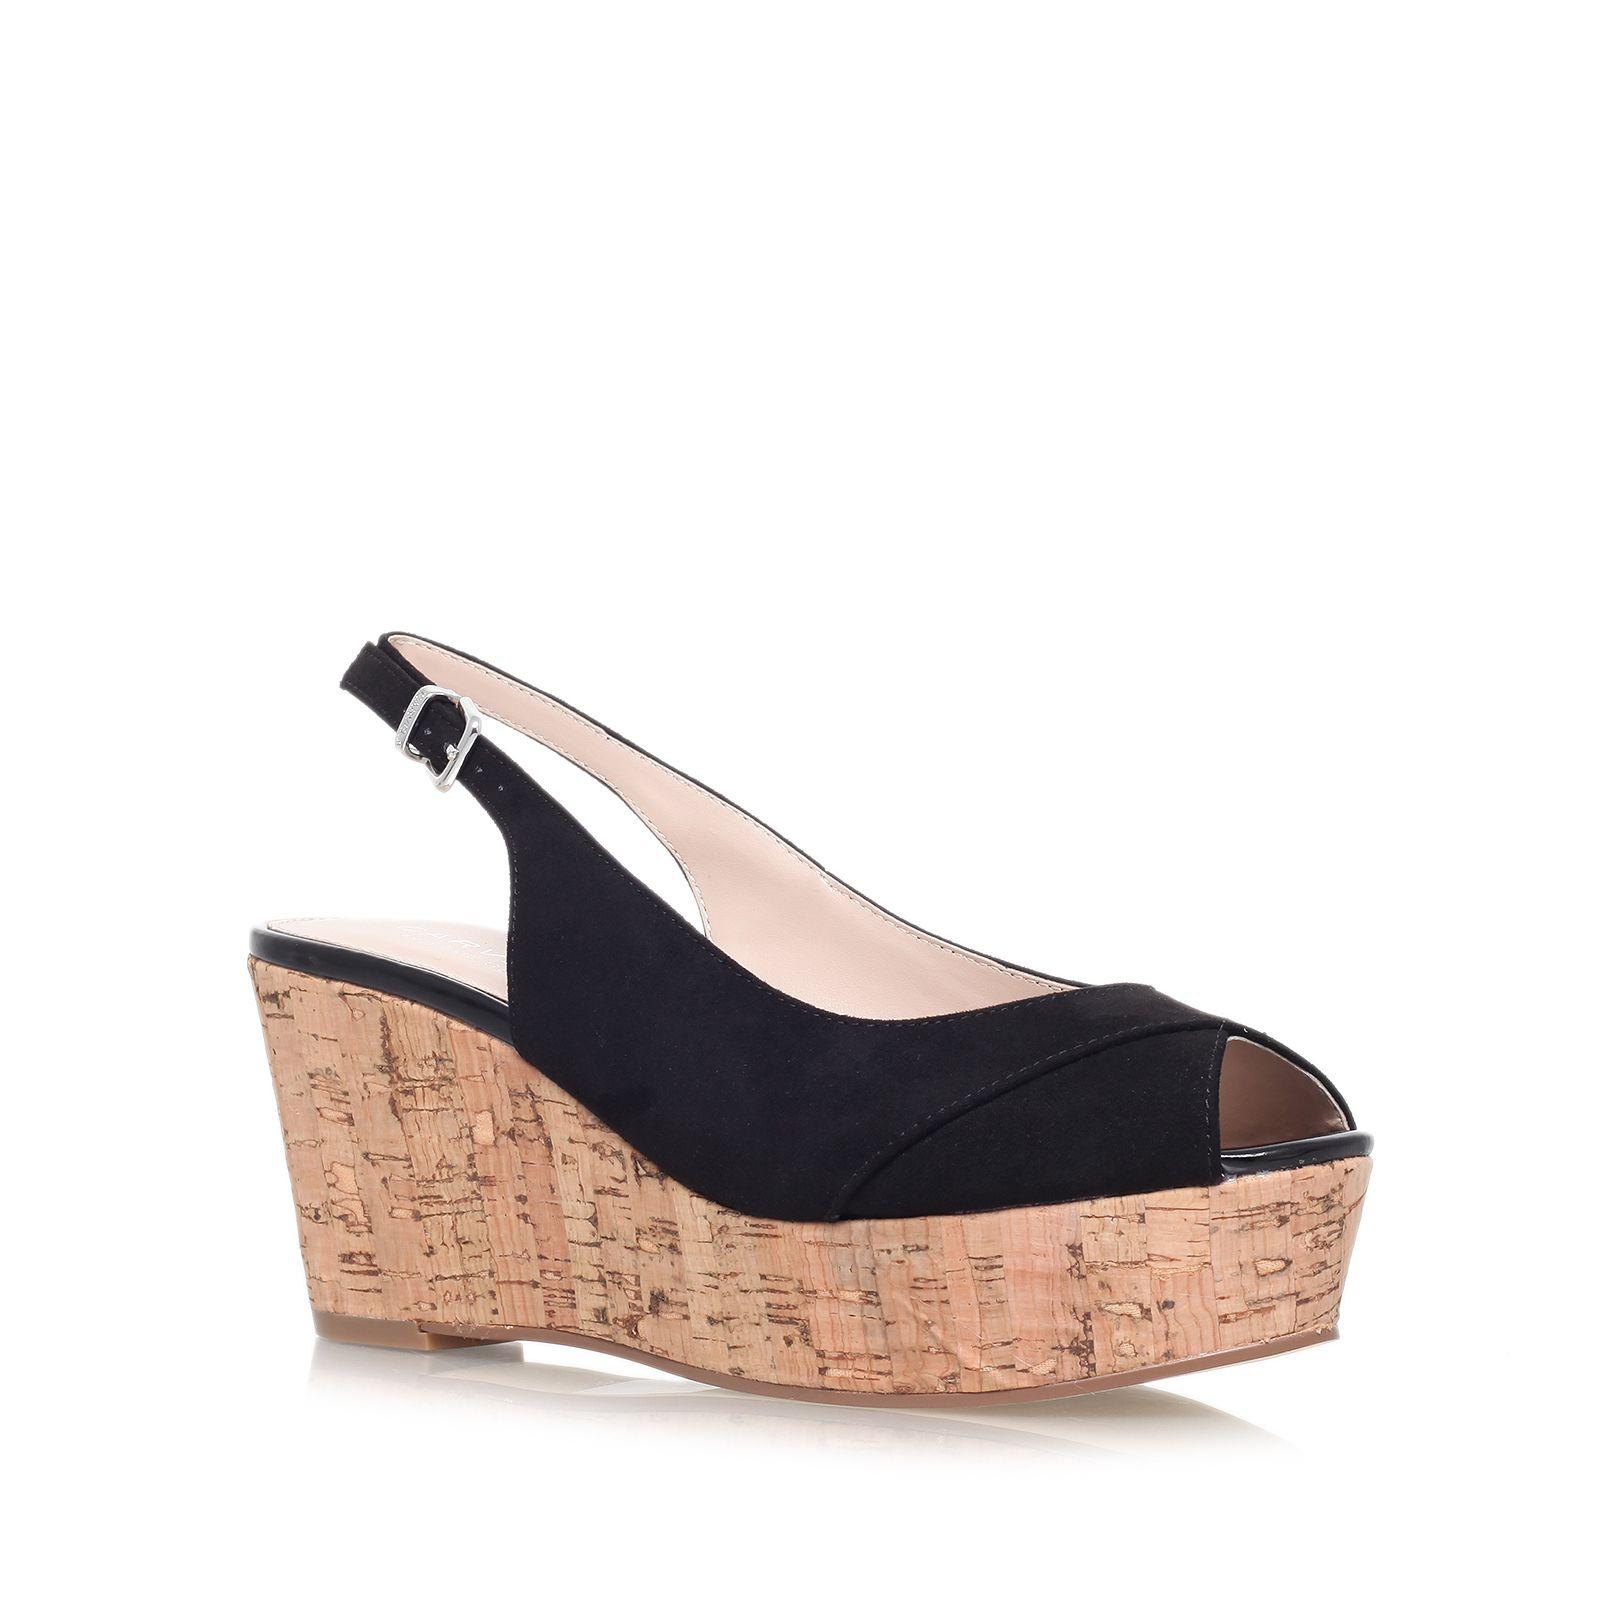 carvela kurt geiger klixy mid wedge sandals in black lyst